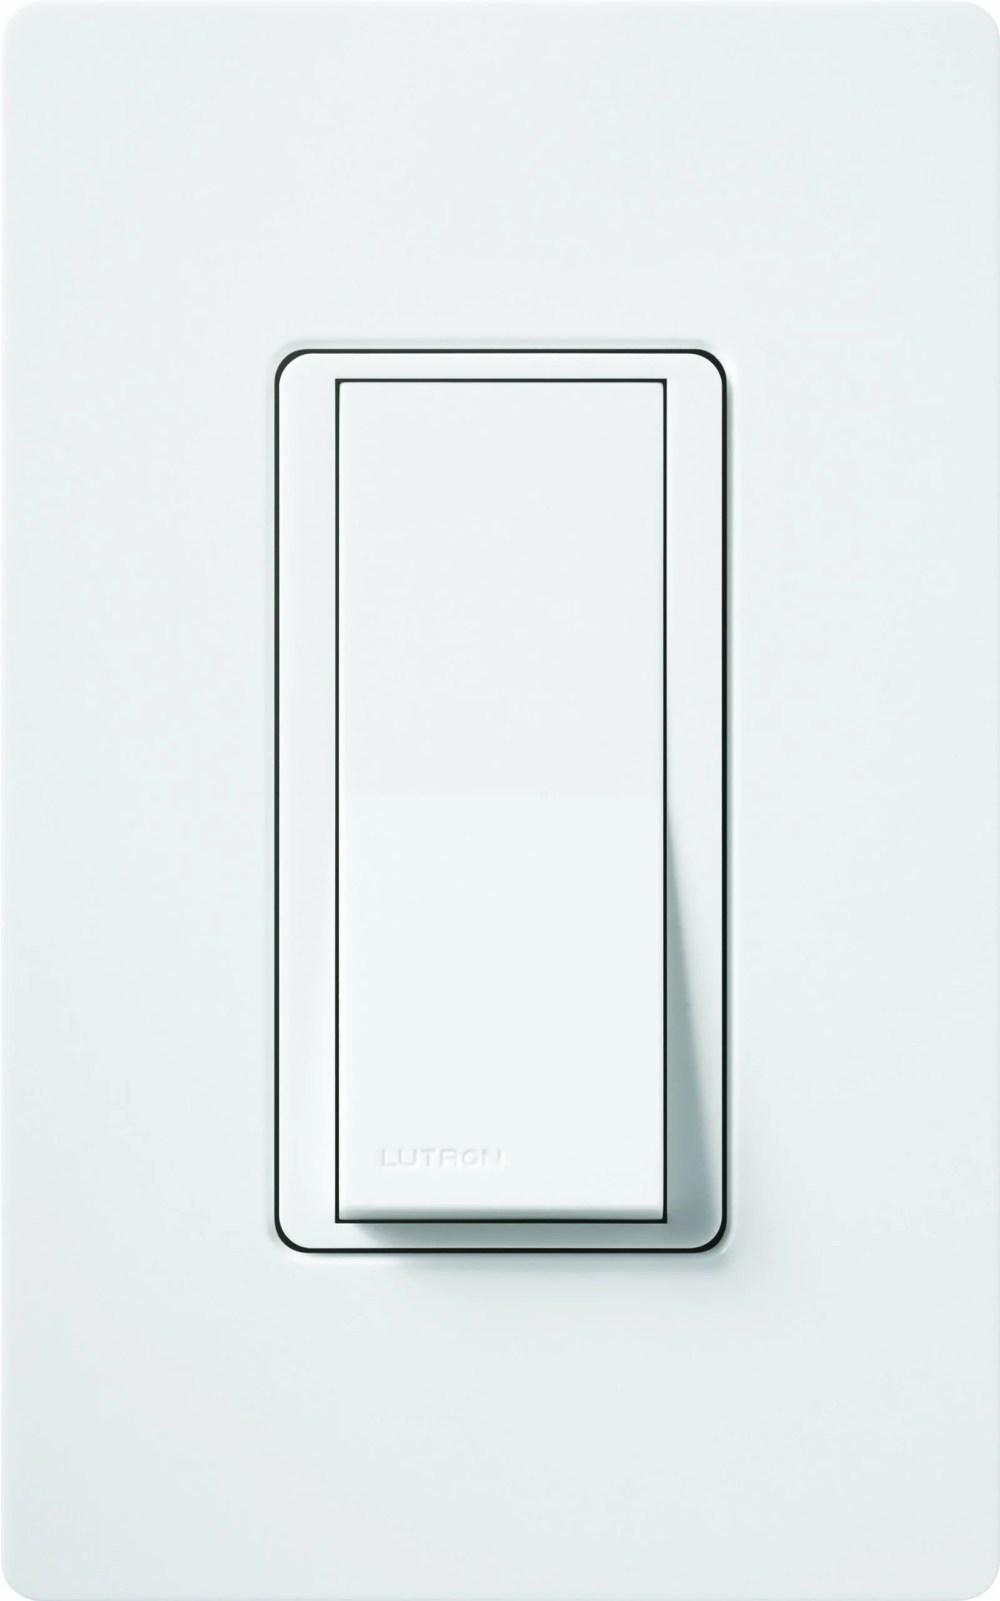 medium resolution of lutron 01627 120 volt 600 watt single pole 3 way switch with locator light walmart com